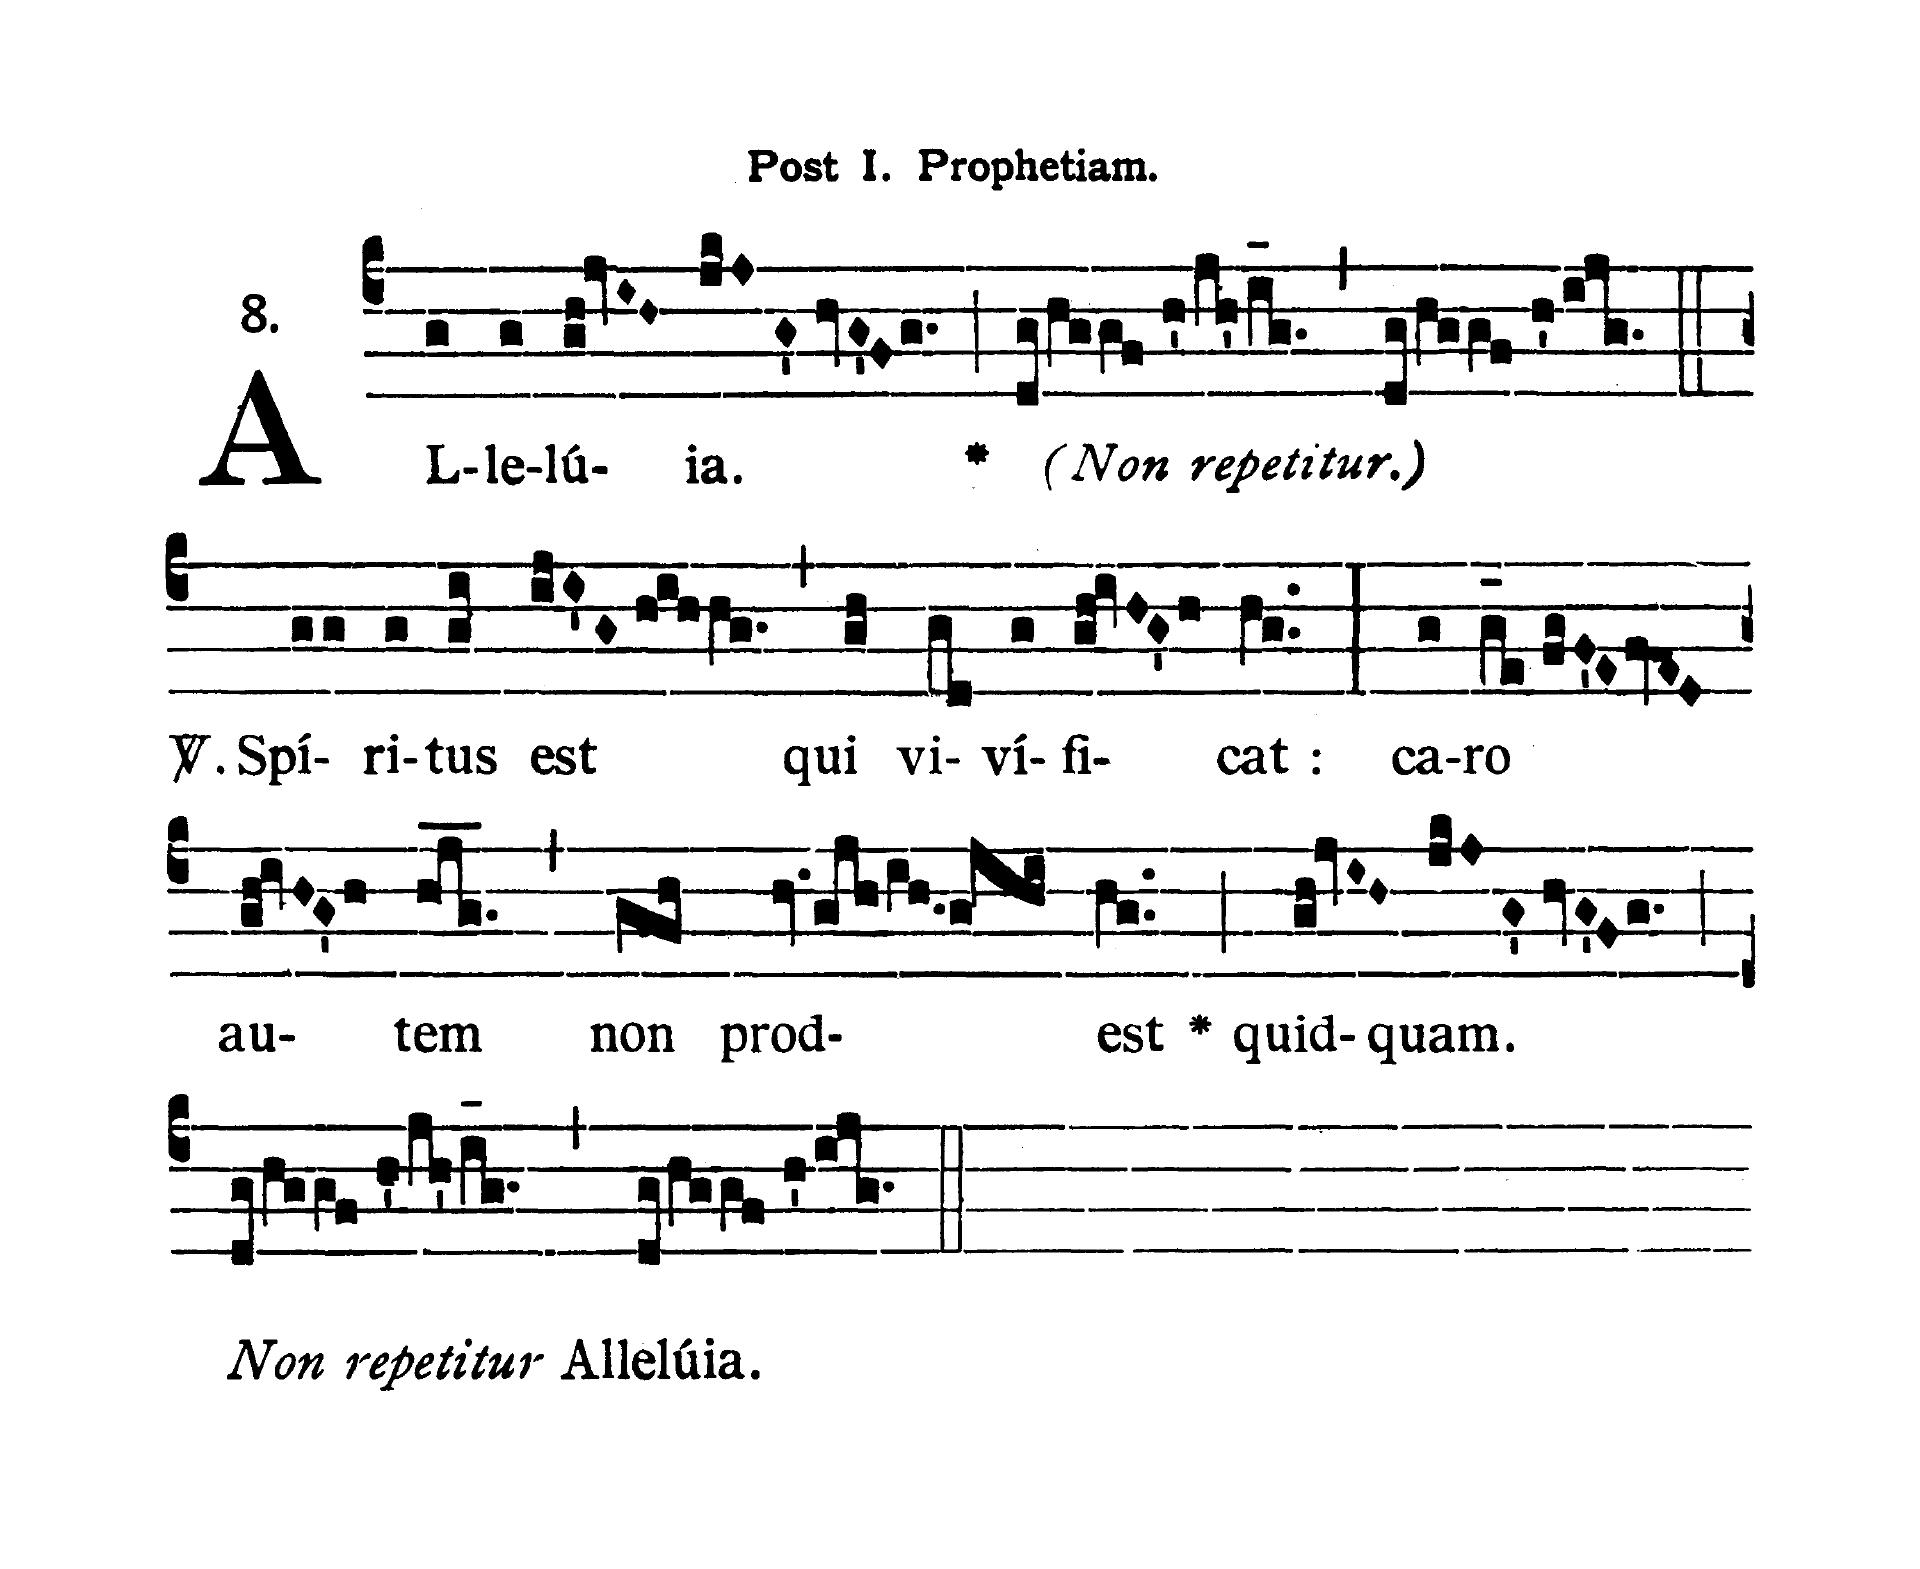 Sabbato infra Octavam Pentecostes (Sobota w oktawie Zesłania Ducha Świętego) - Alleluia prima (Spiritus est qui vivificat)